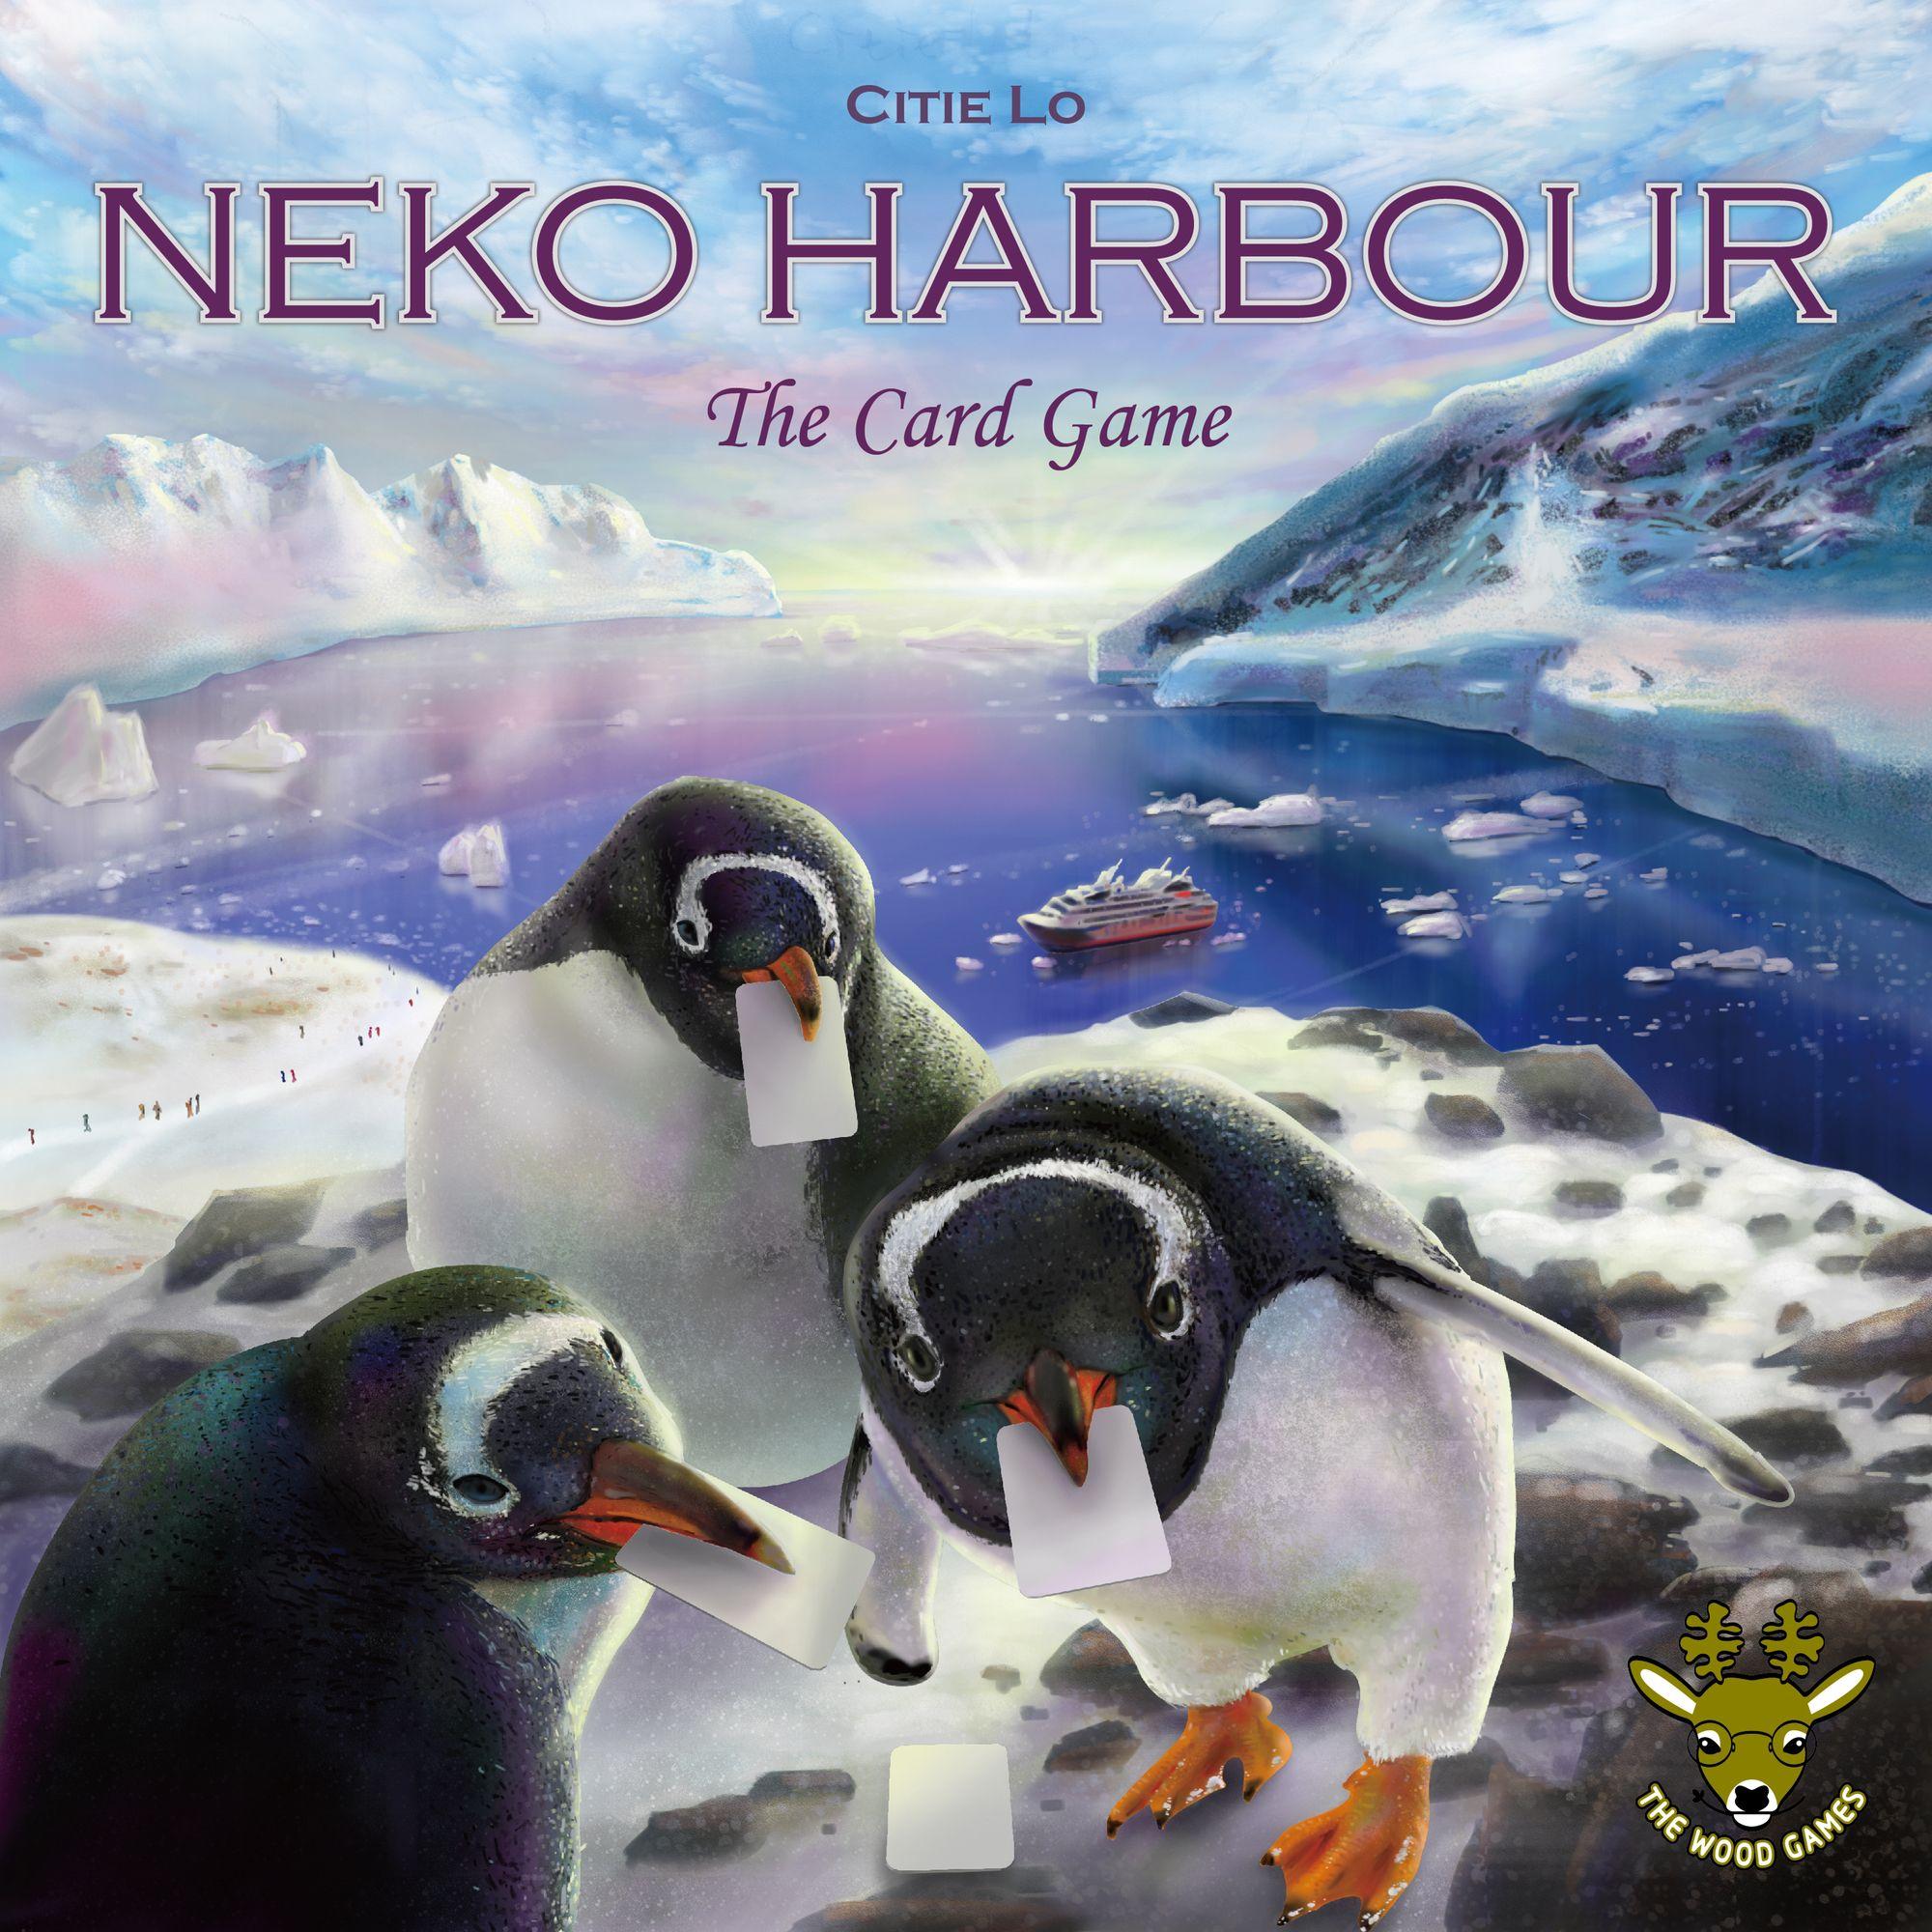 Neko Harbour: The Card Game